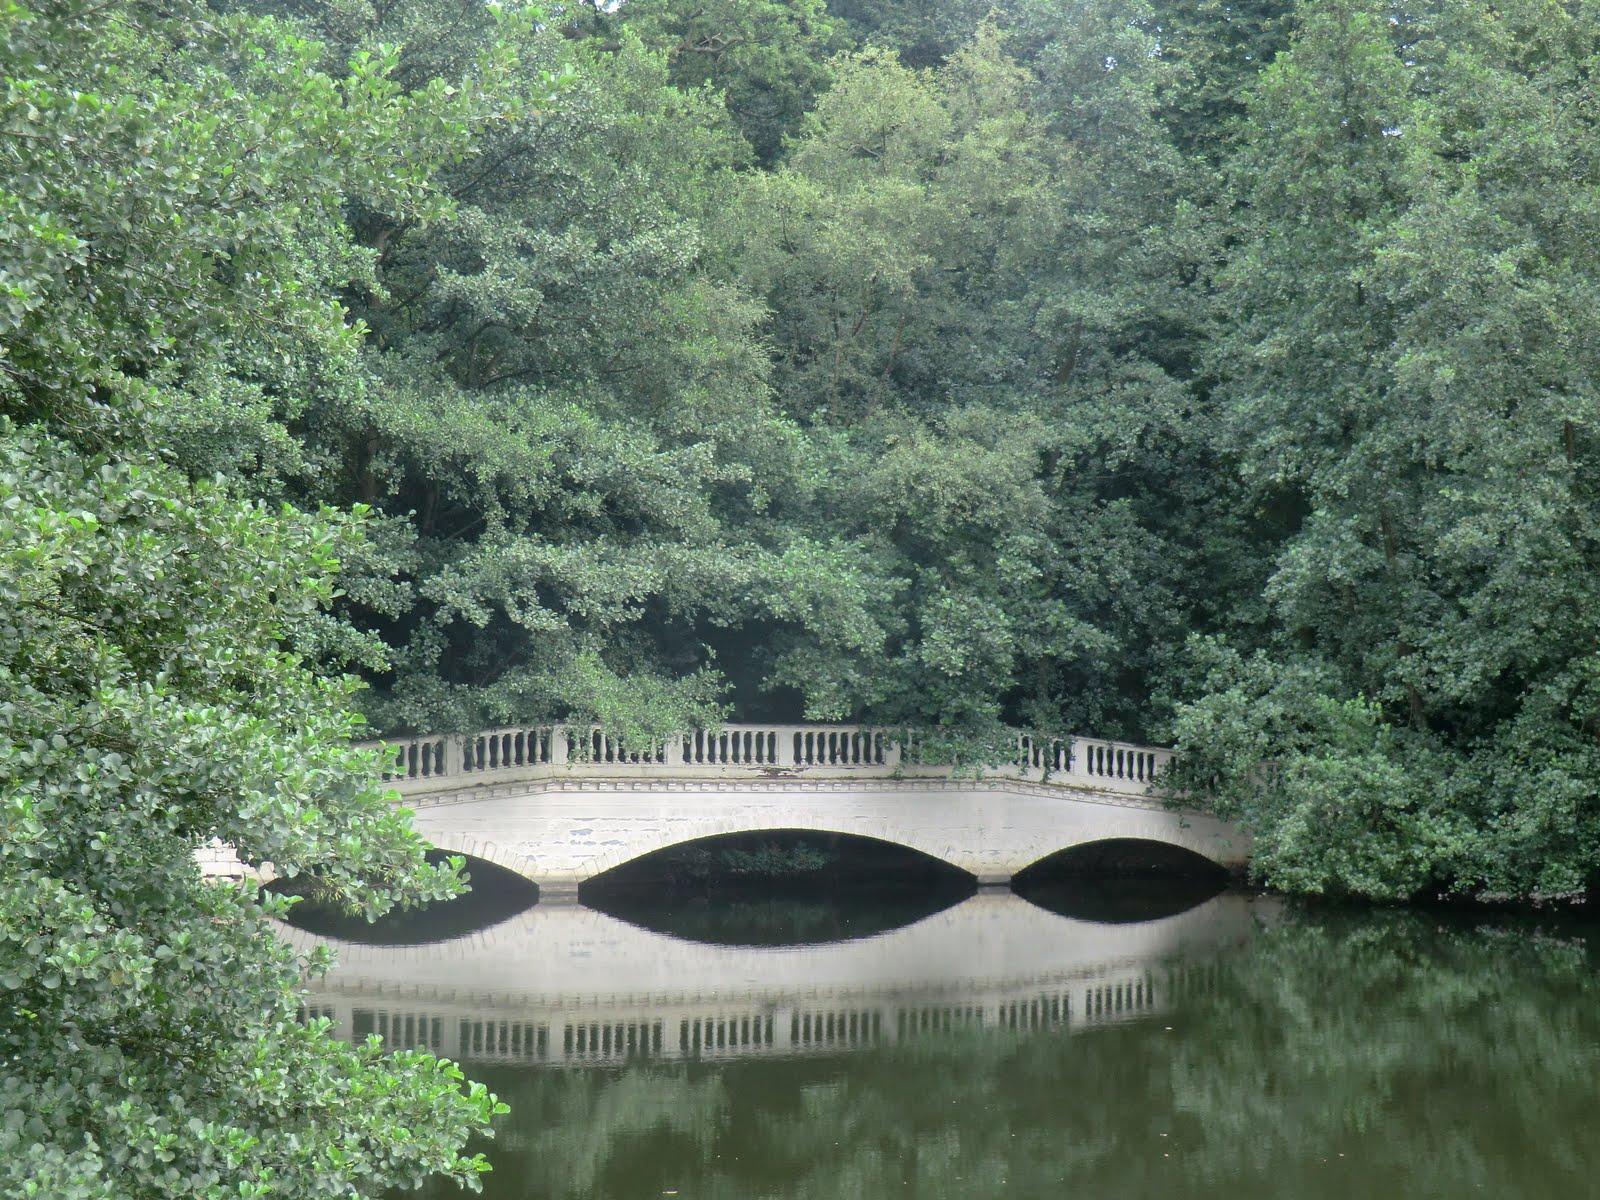 CIMG9719 Sham Bridge, Kenwood Estate